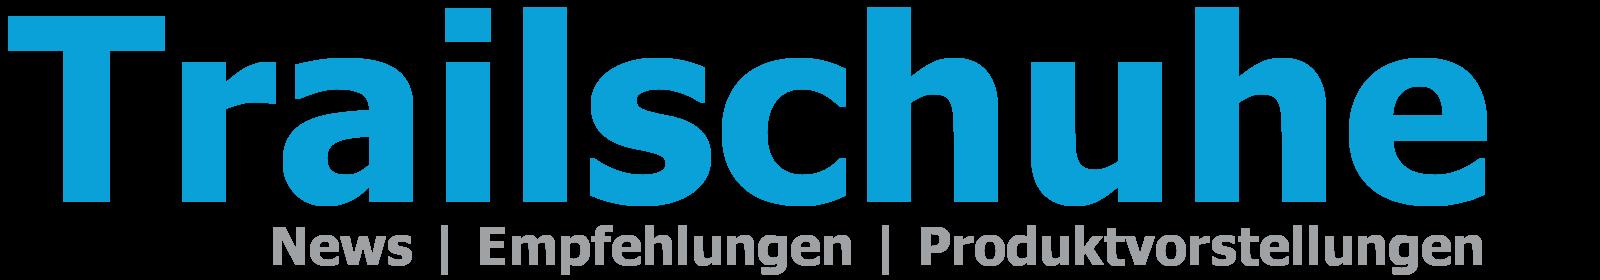 Trailschuhe_logo_blau